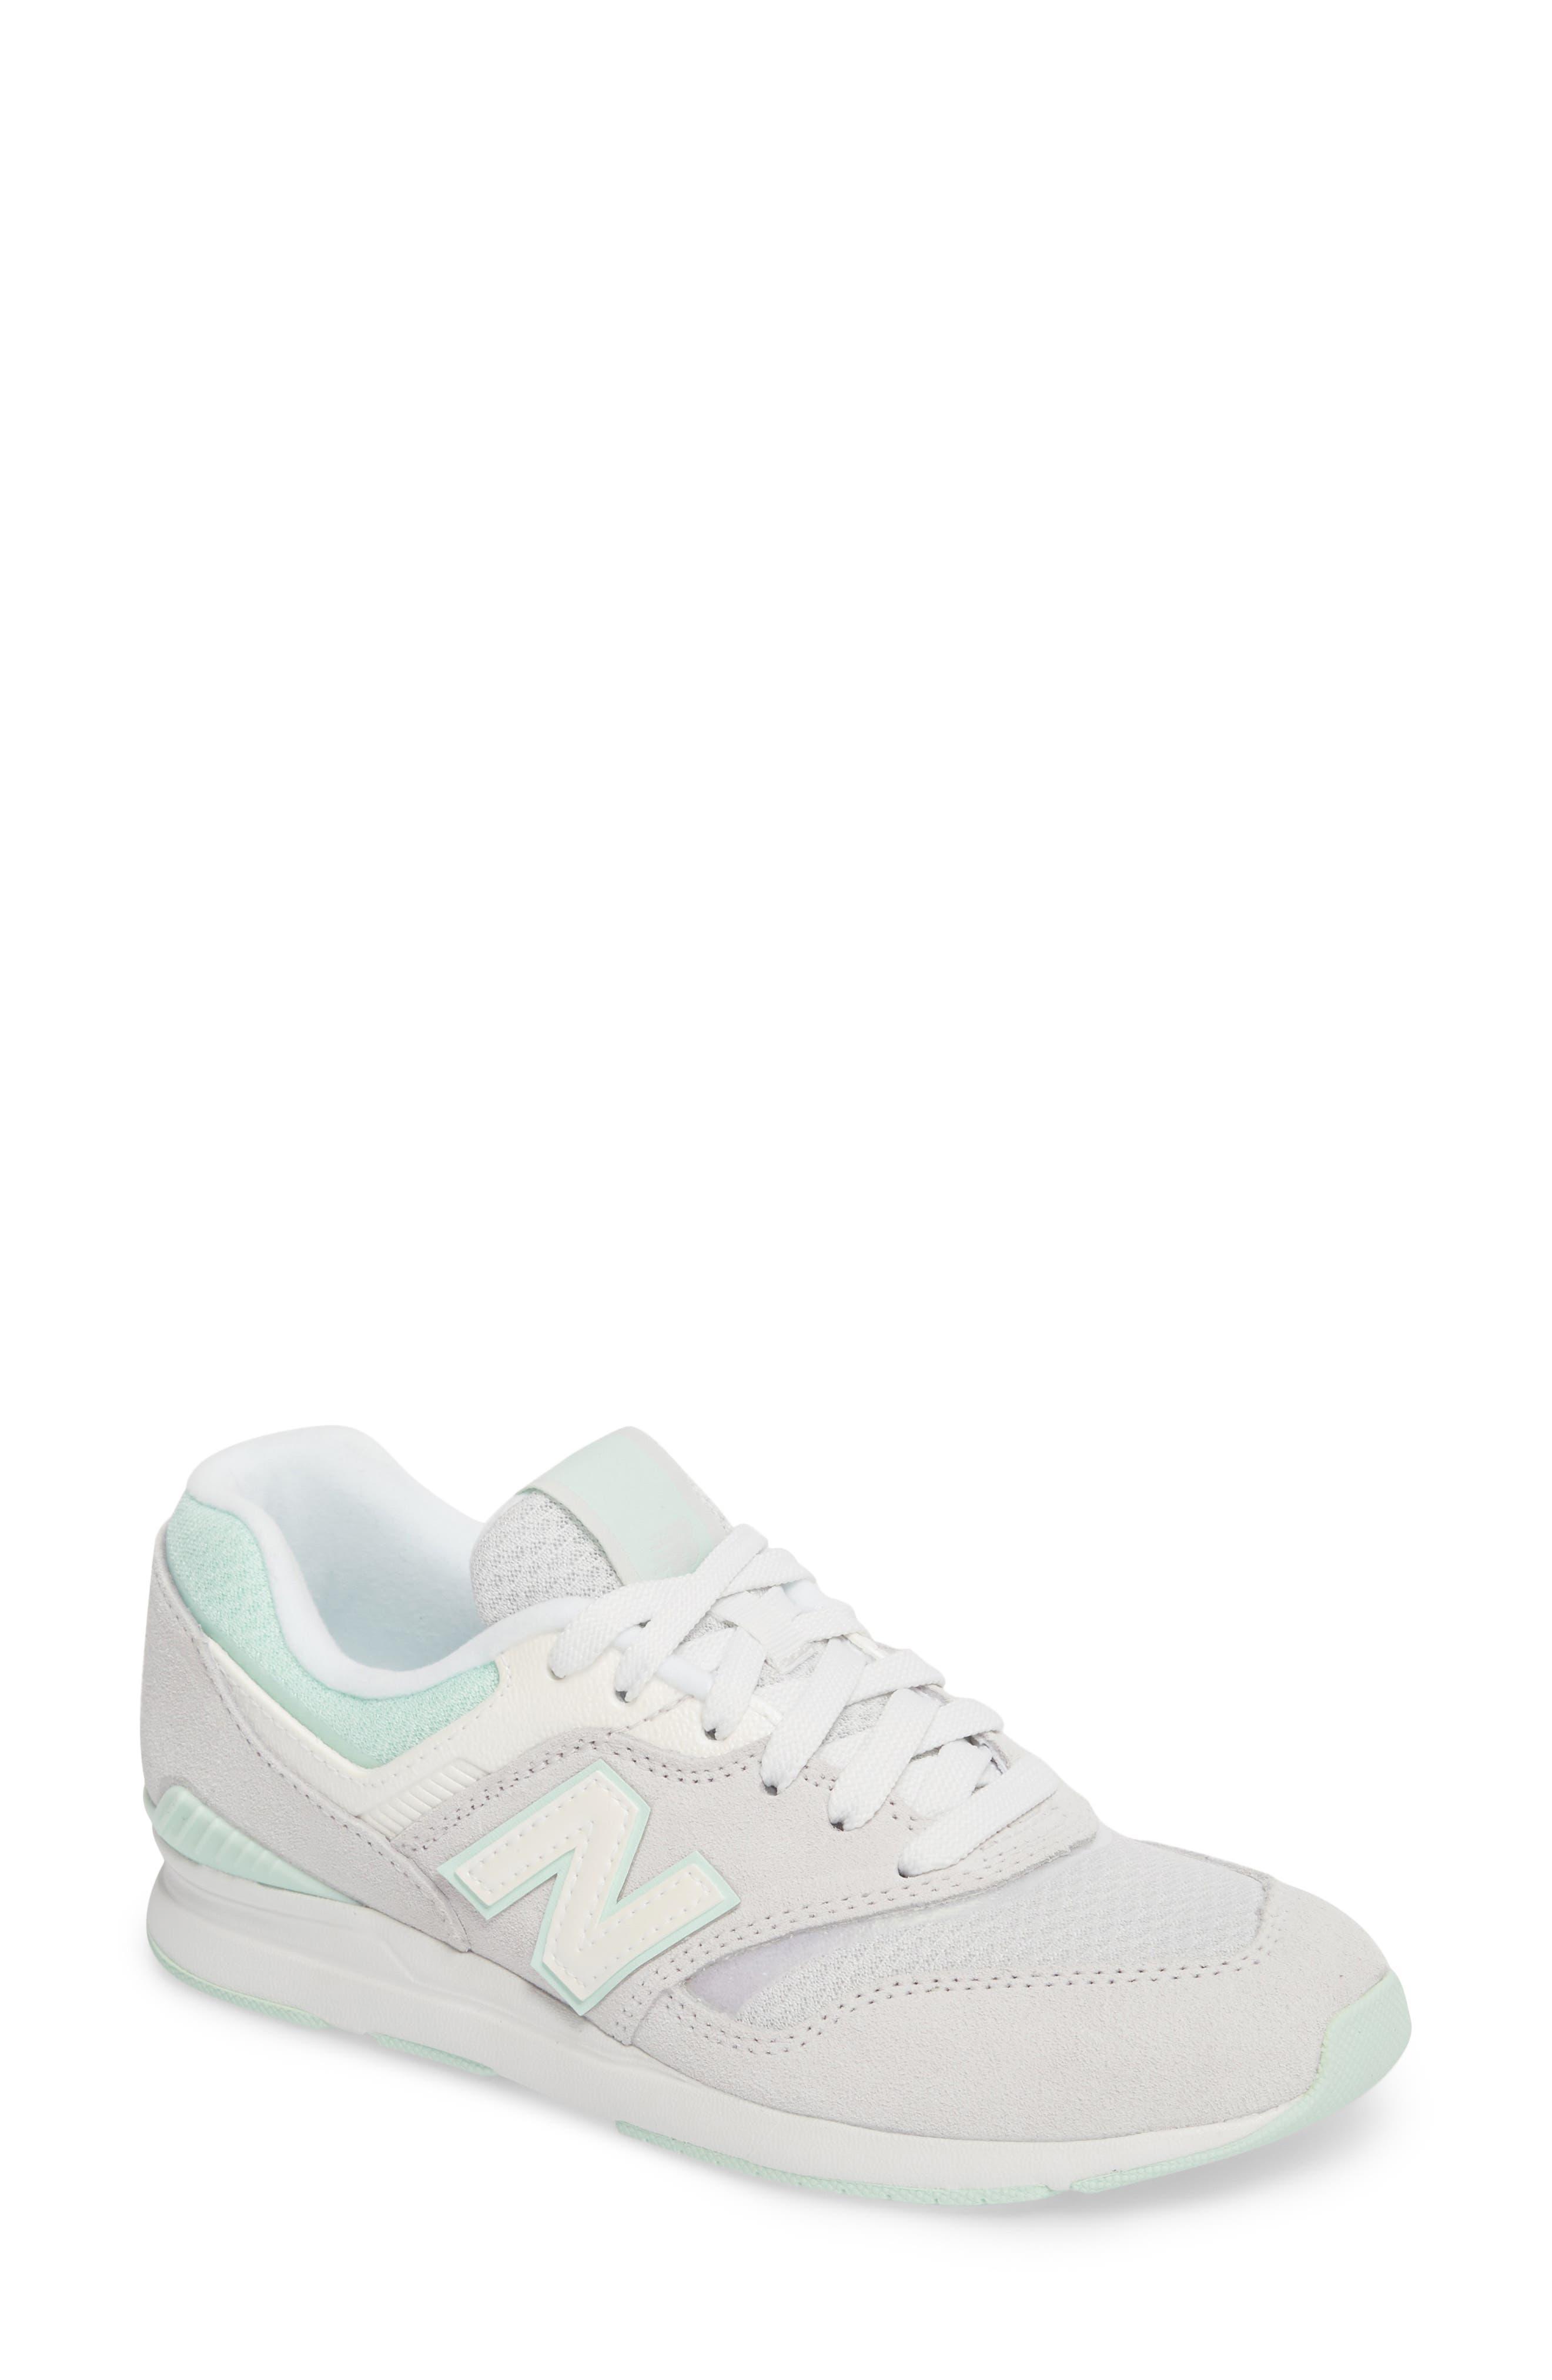 New Balance Leather 697 Sneaker (Women)